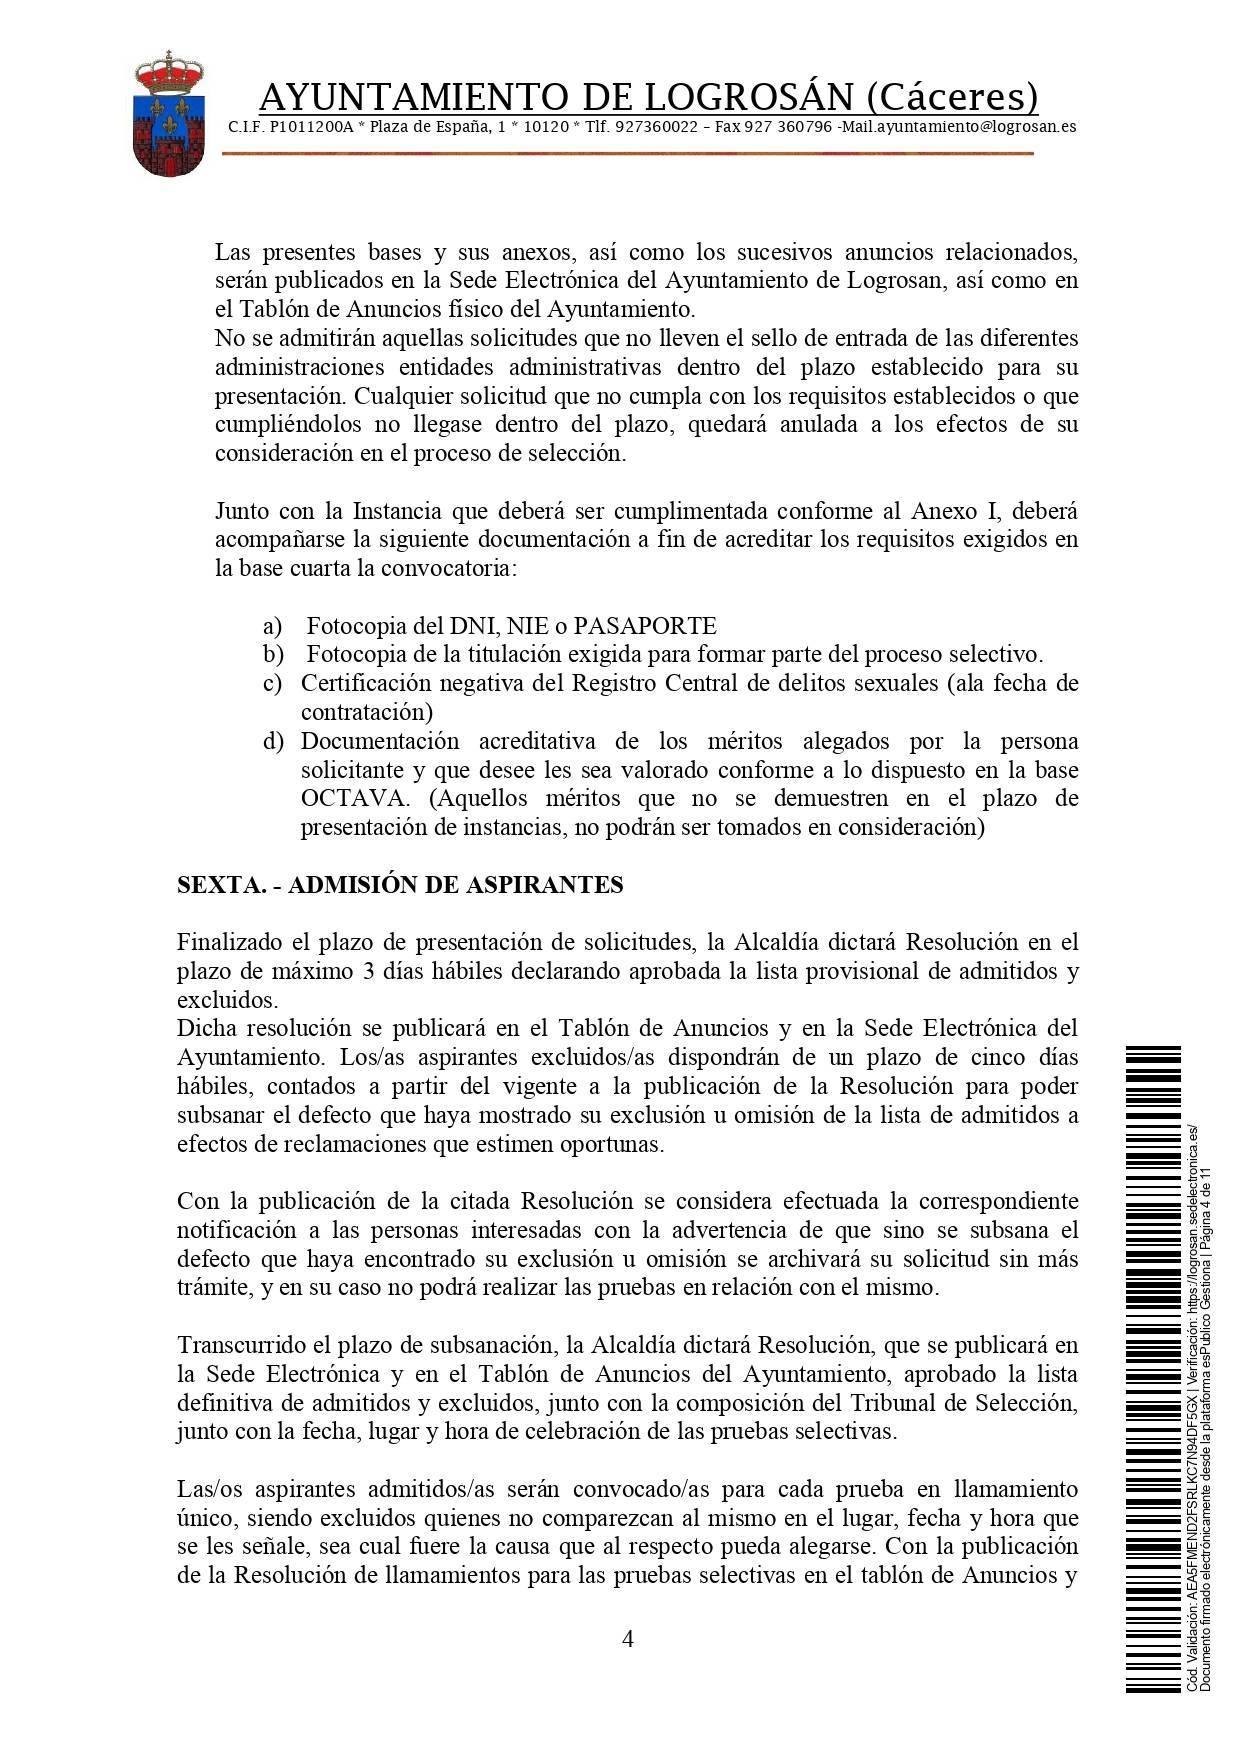 Bolsa de técnicos-as en educación infantil (2021) - Logrosán (Cáceres) 4